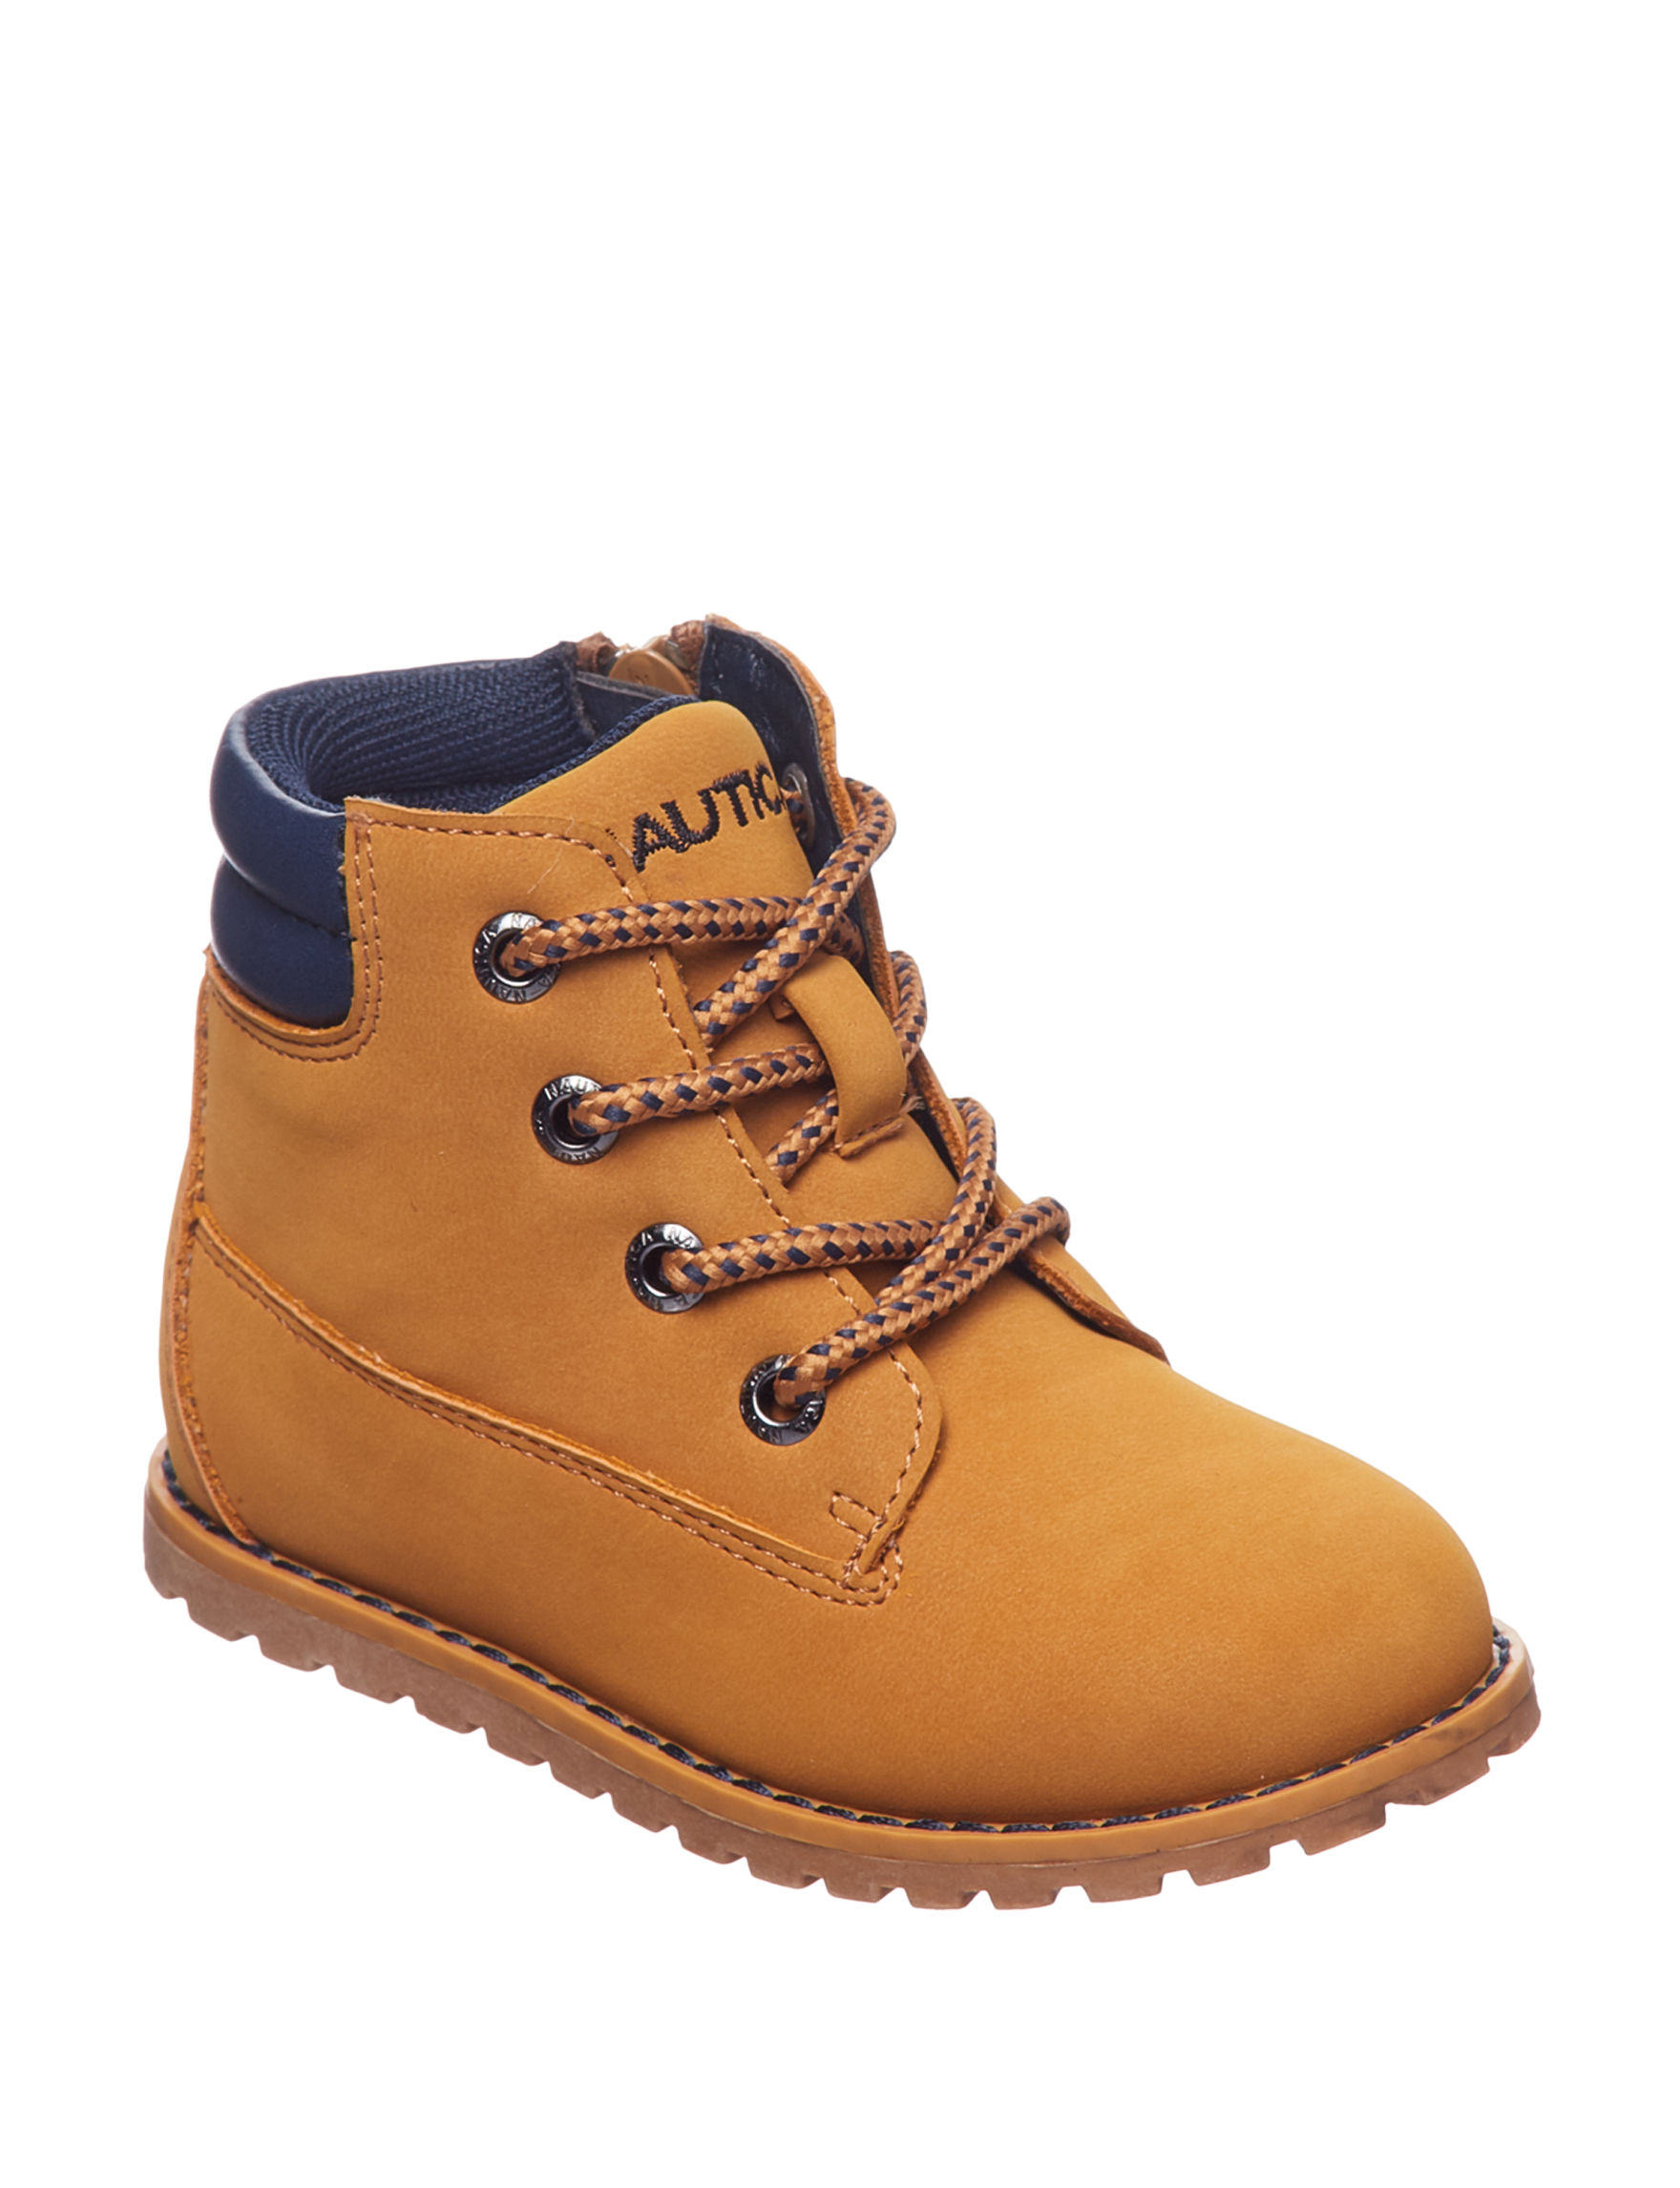 Nautica Light Brown Hiking Boots